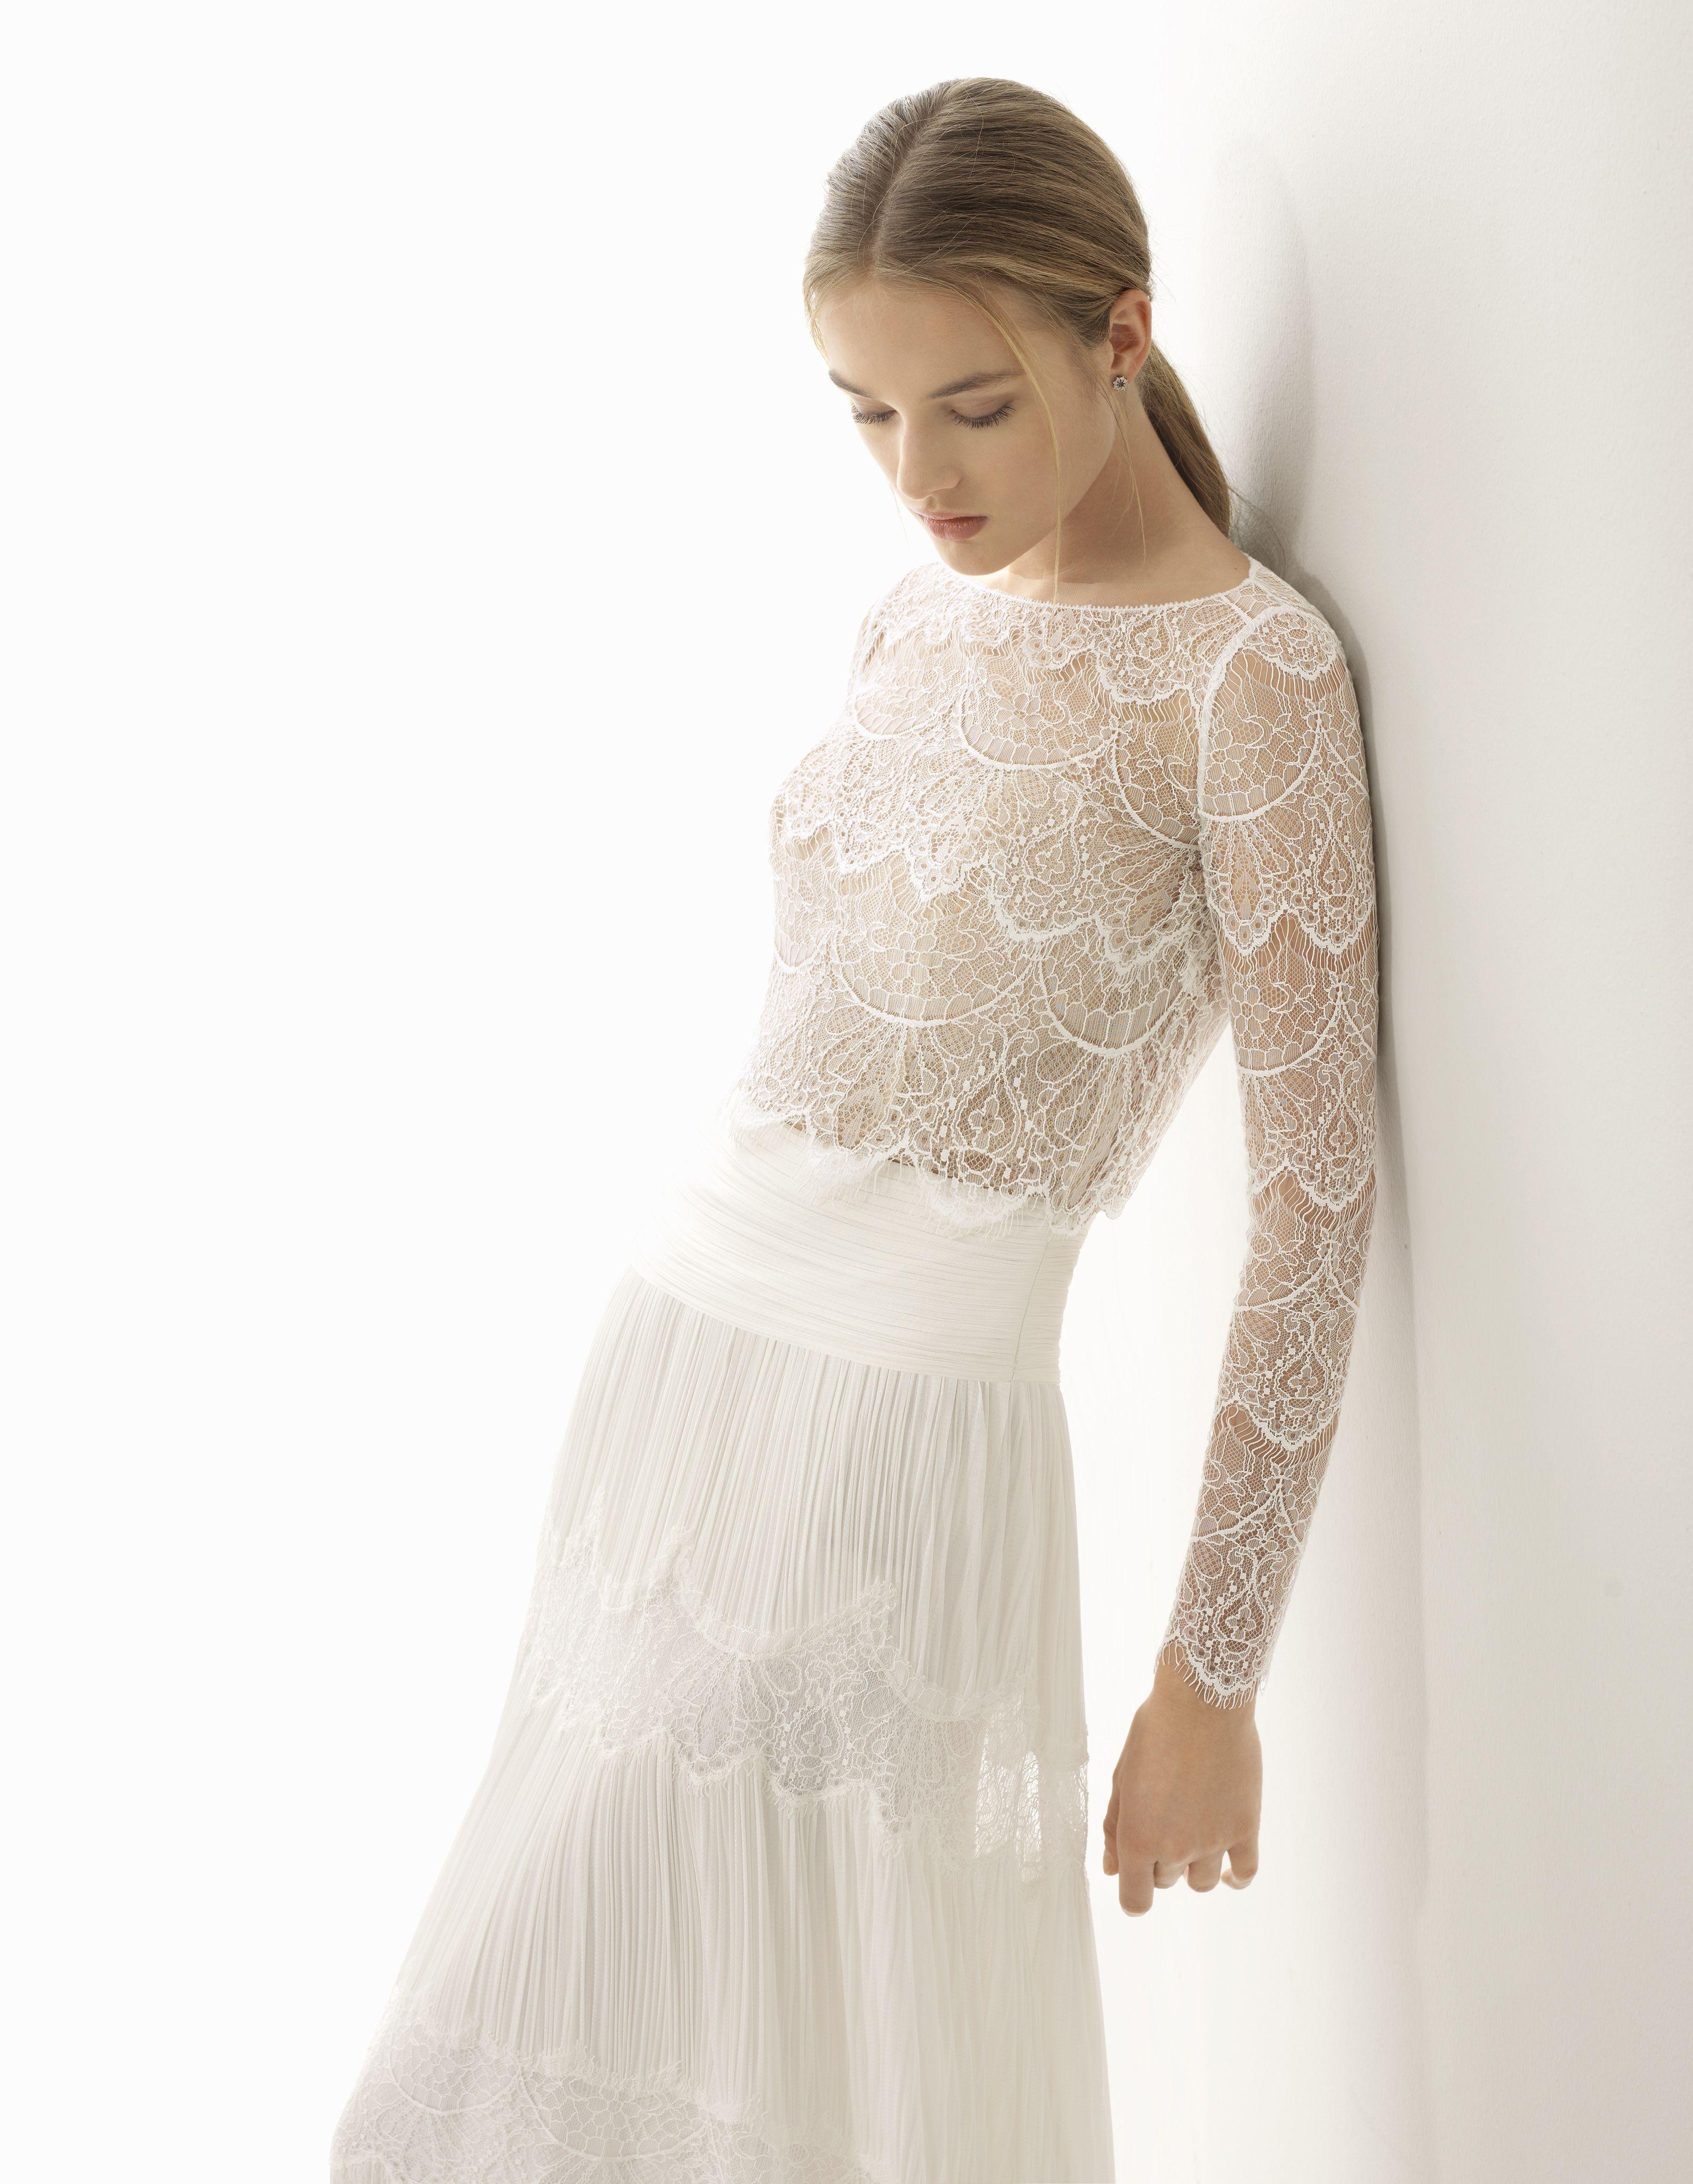 Erfreut Davids Braut Mutterschaft Kleider Hochzeit Ideen ...